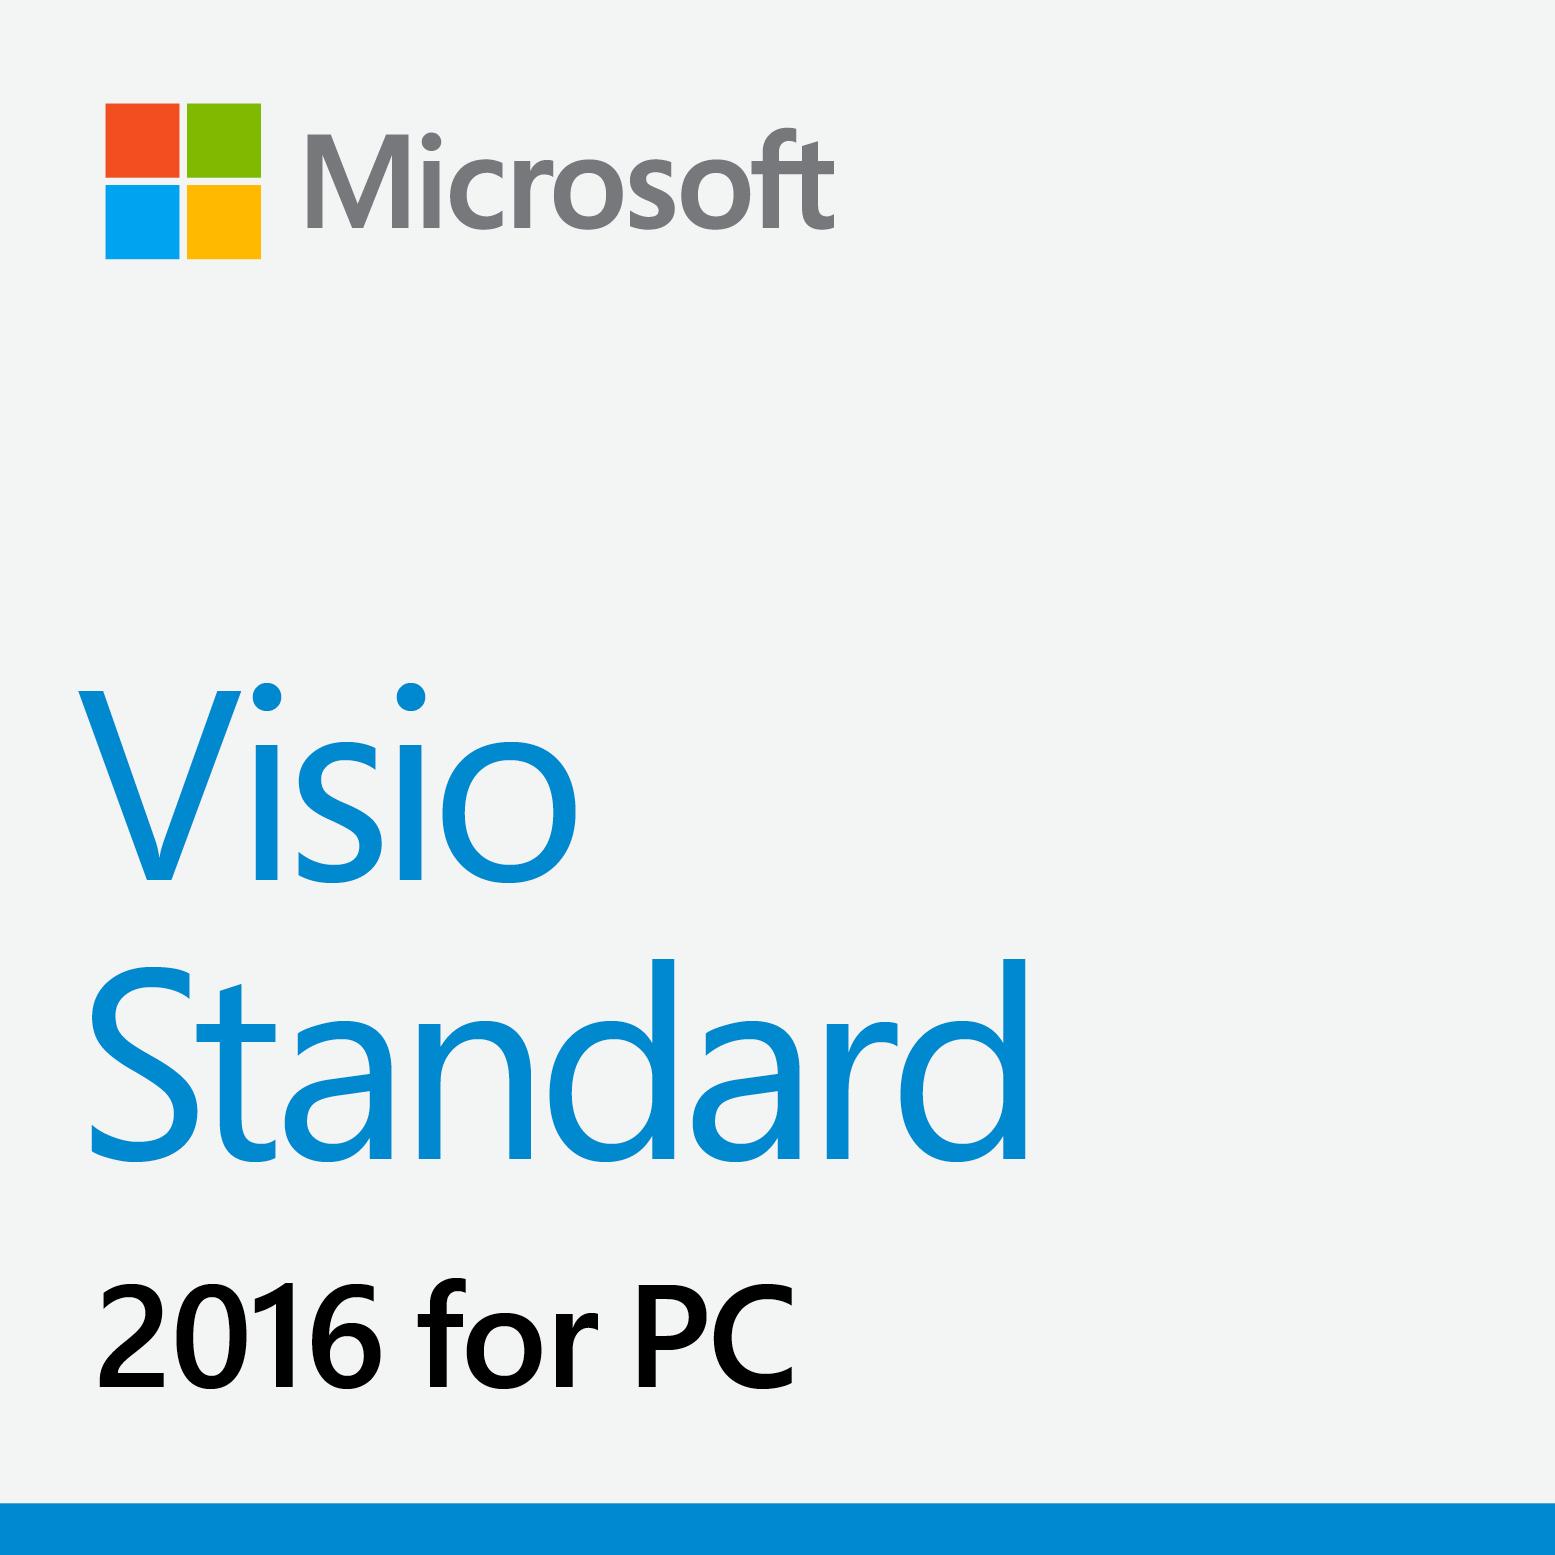 Visio Standard 2016